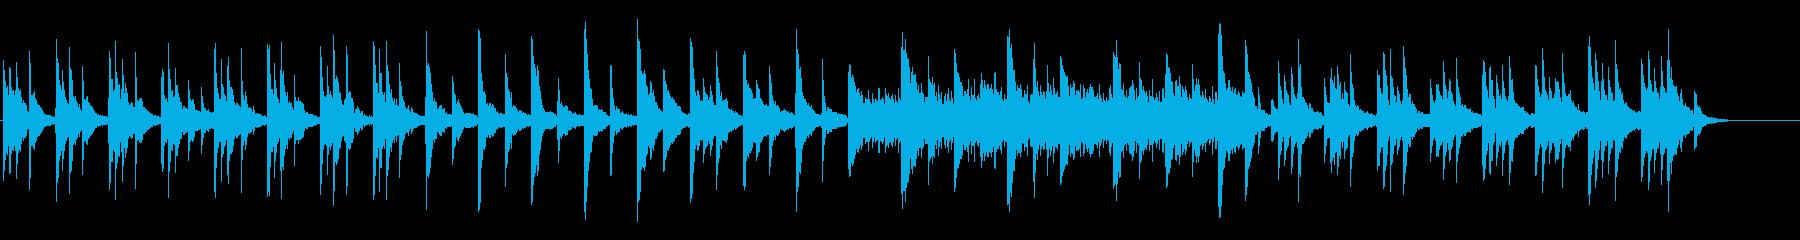 Deep Blue KURAGEピアノ版の再生済みの波形